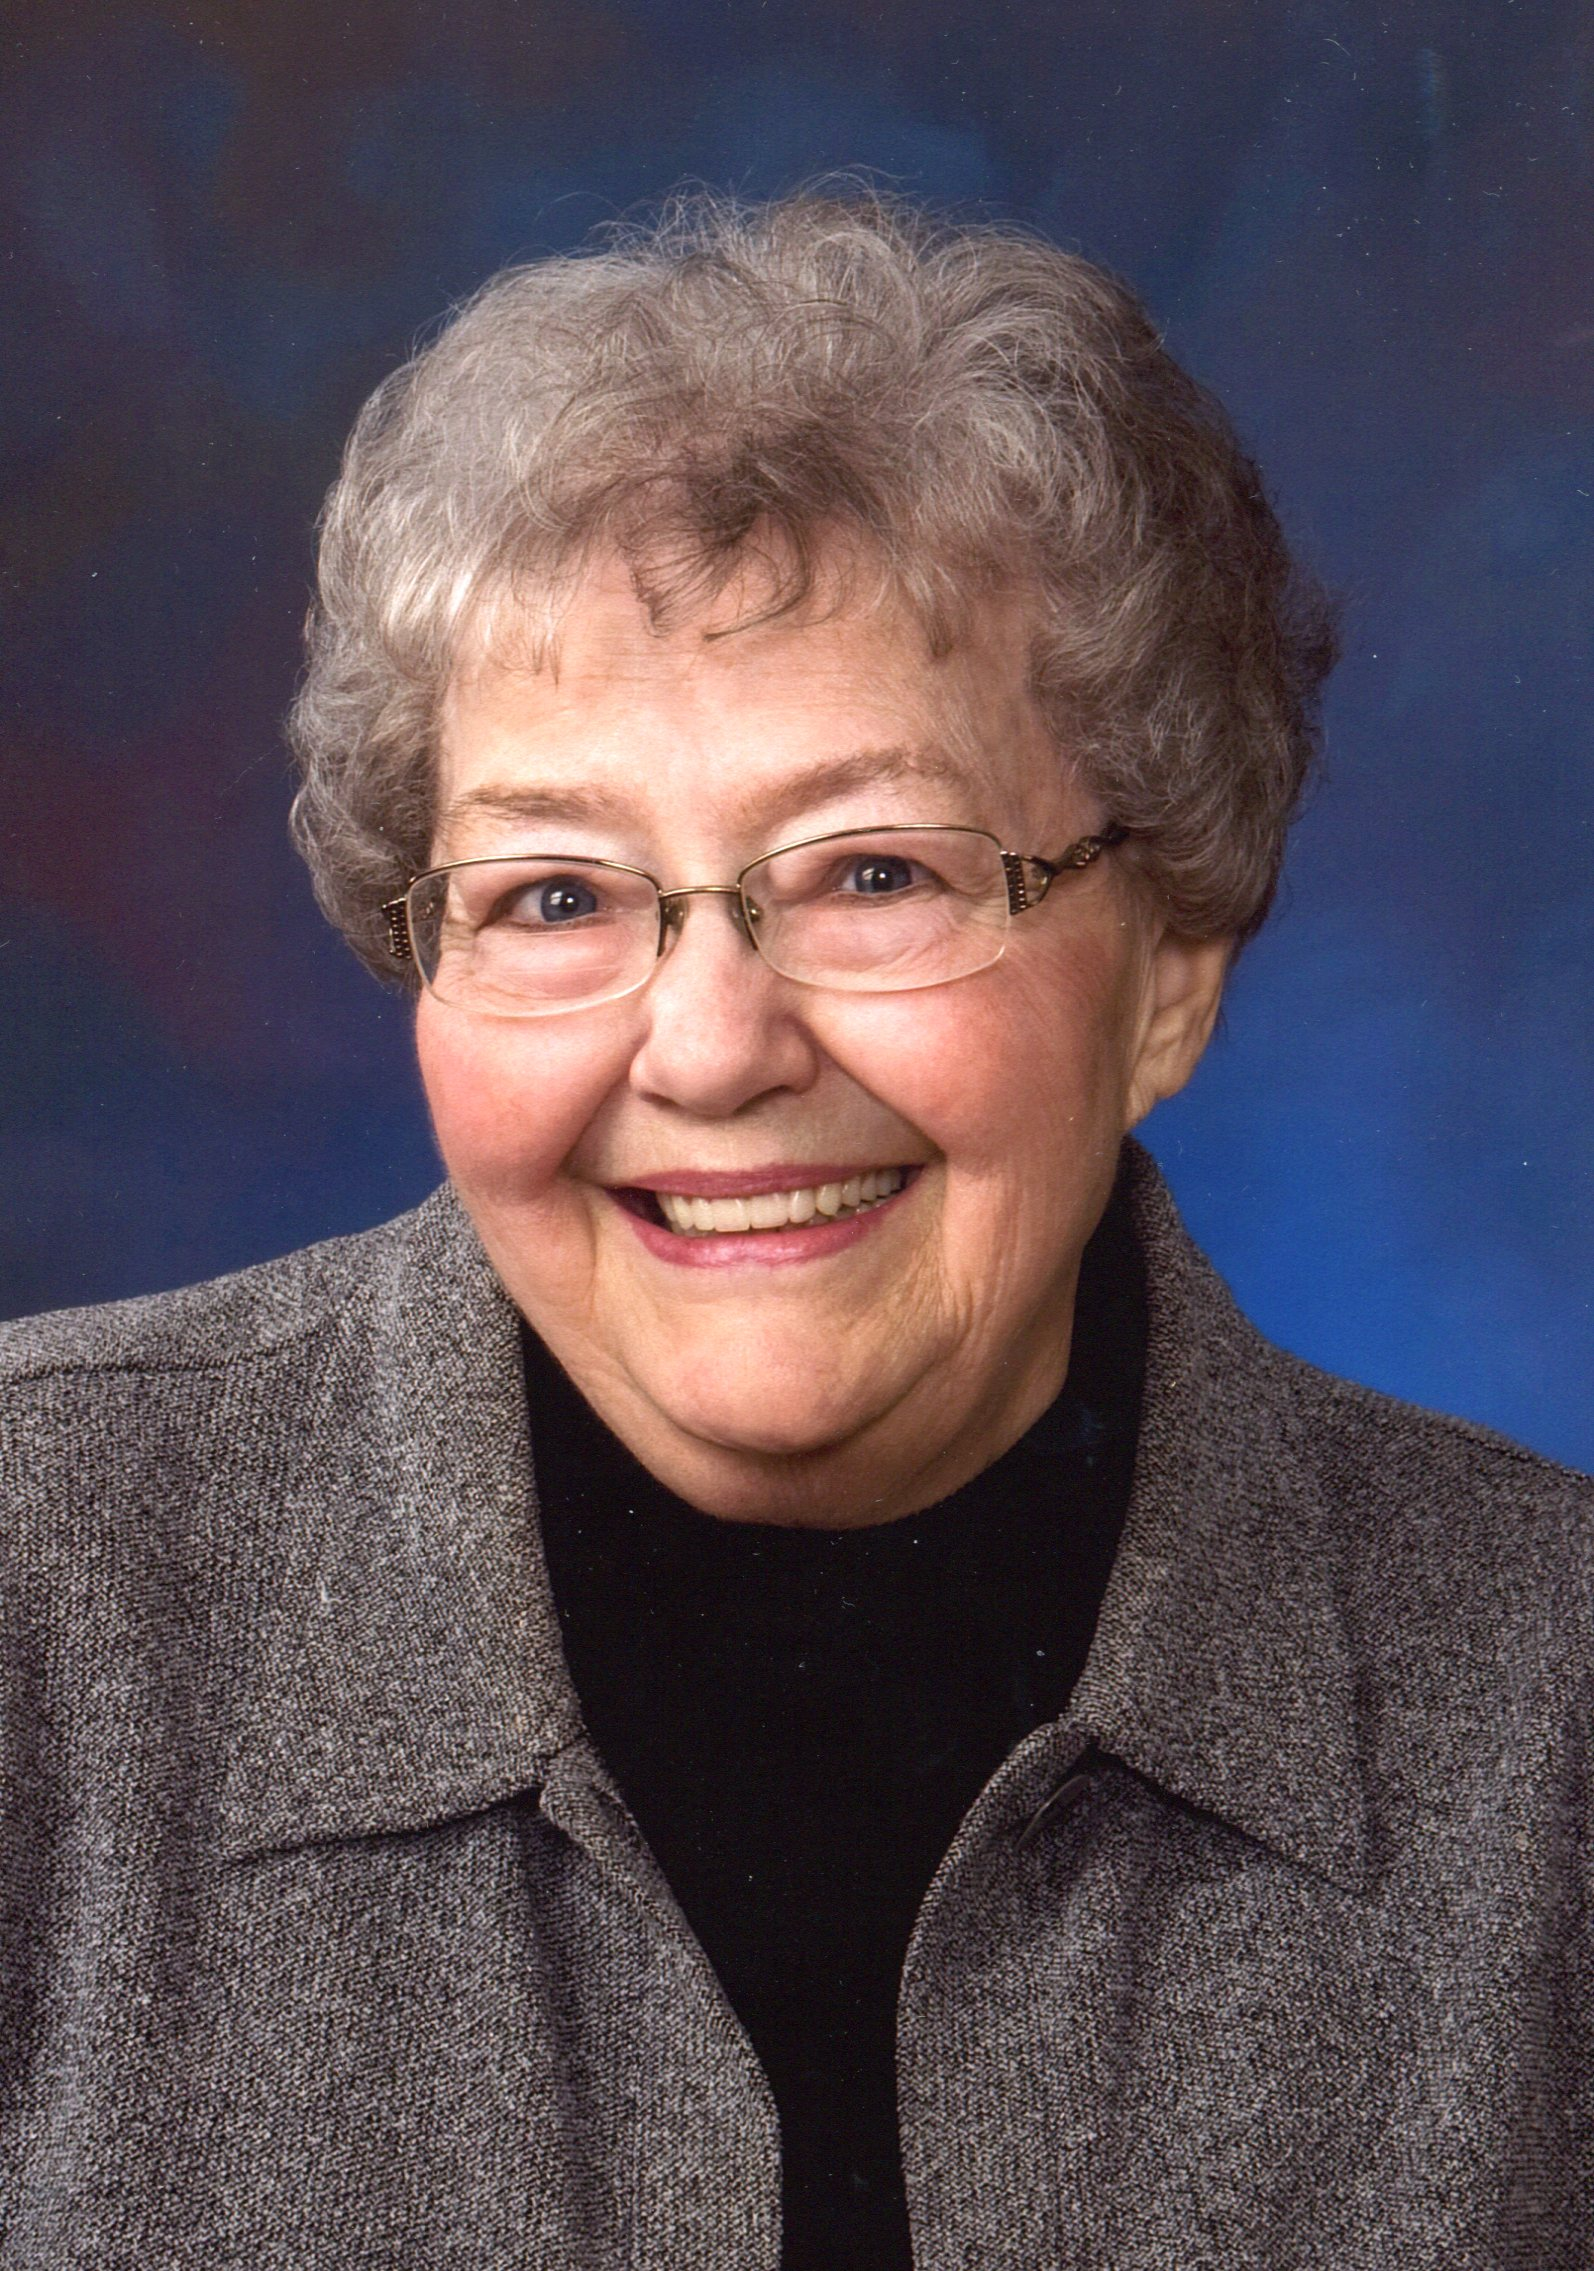 Shirley J. Flack, 85, Scottsbluff